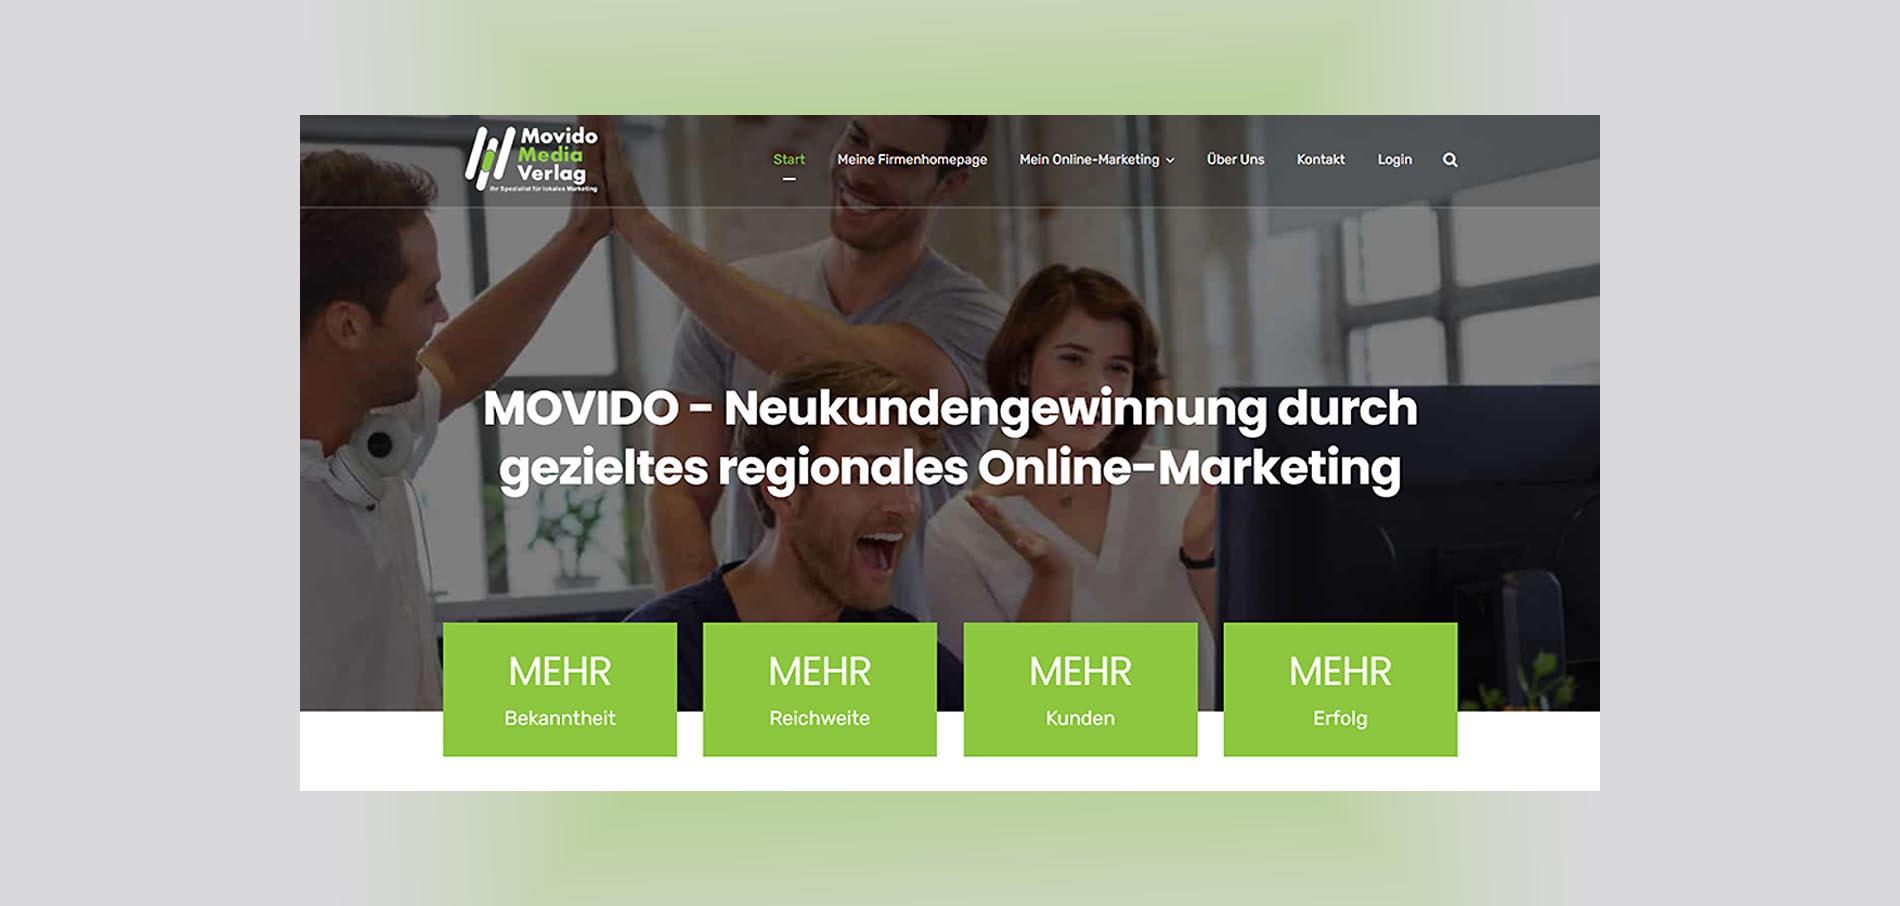 Movido Media Verlag GmbH